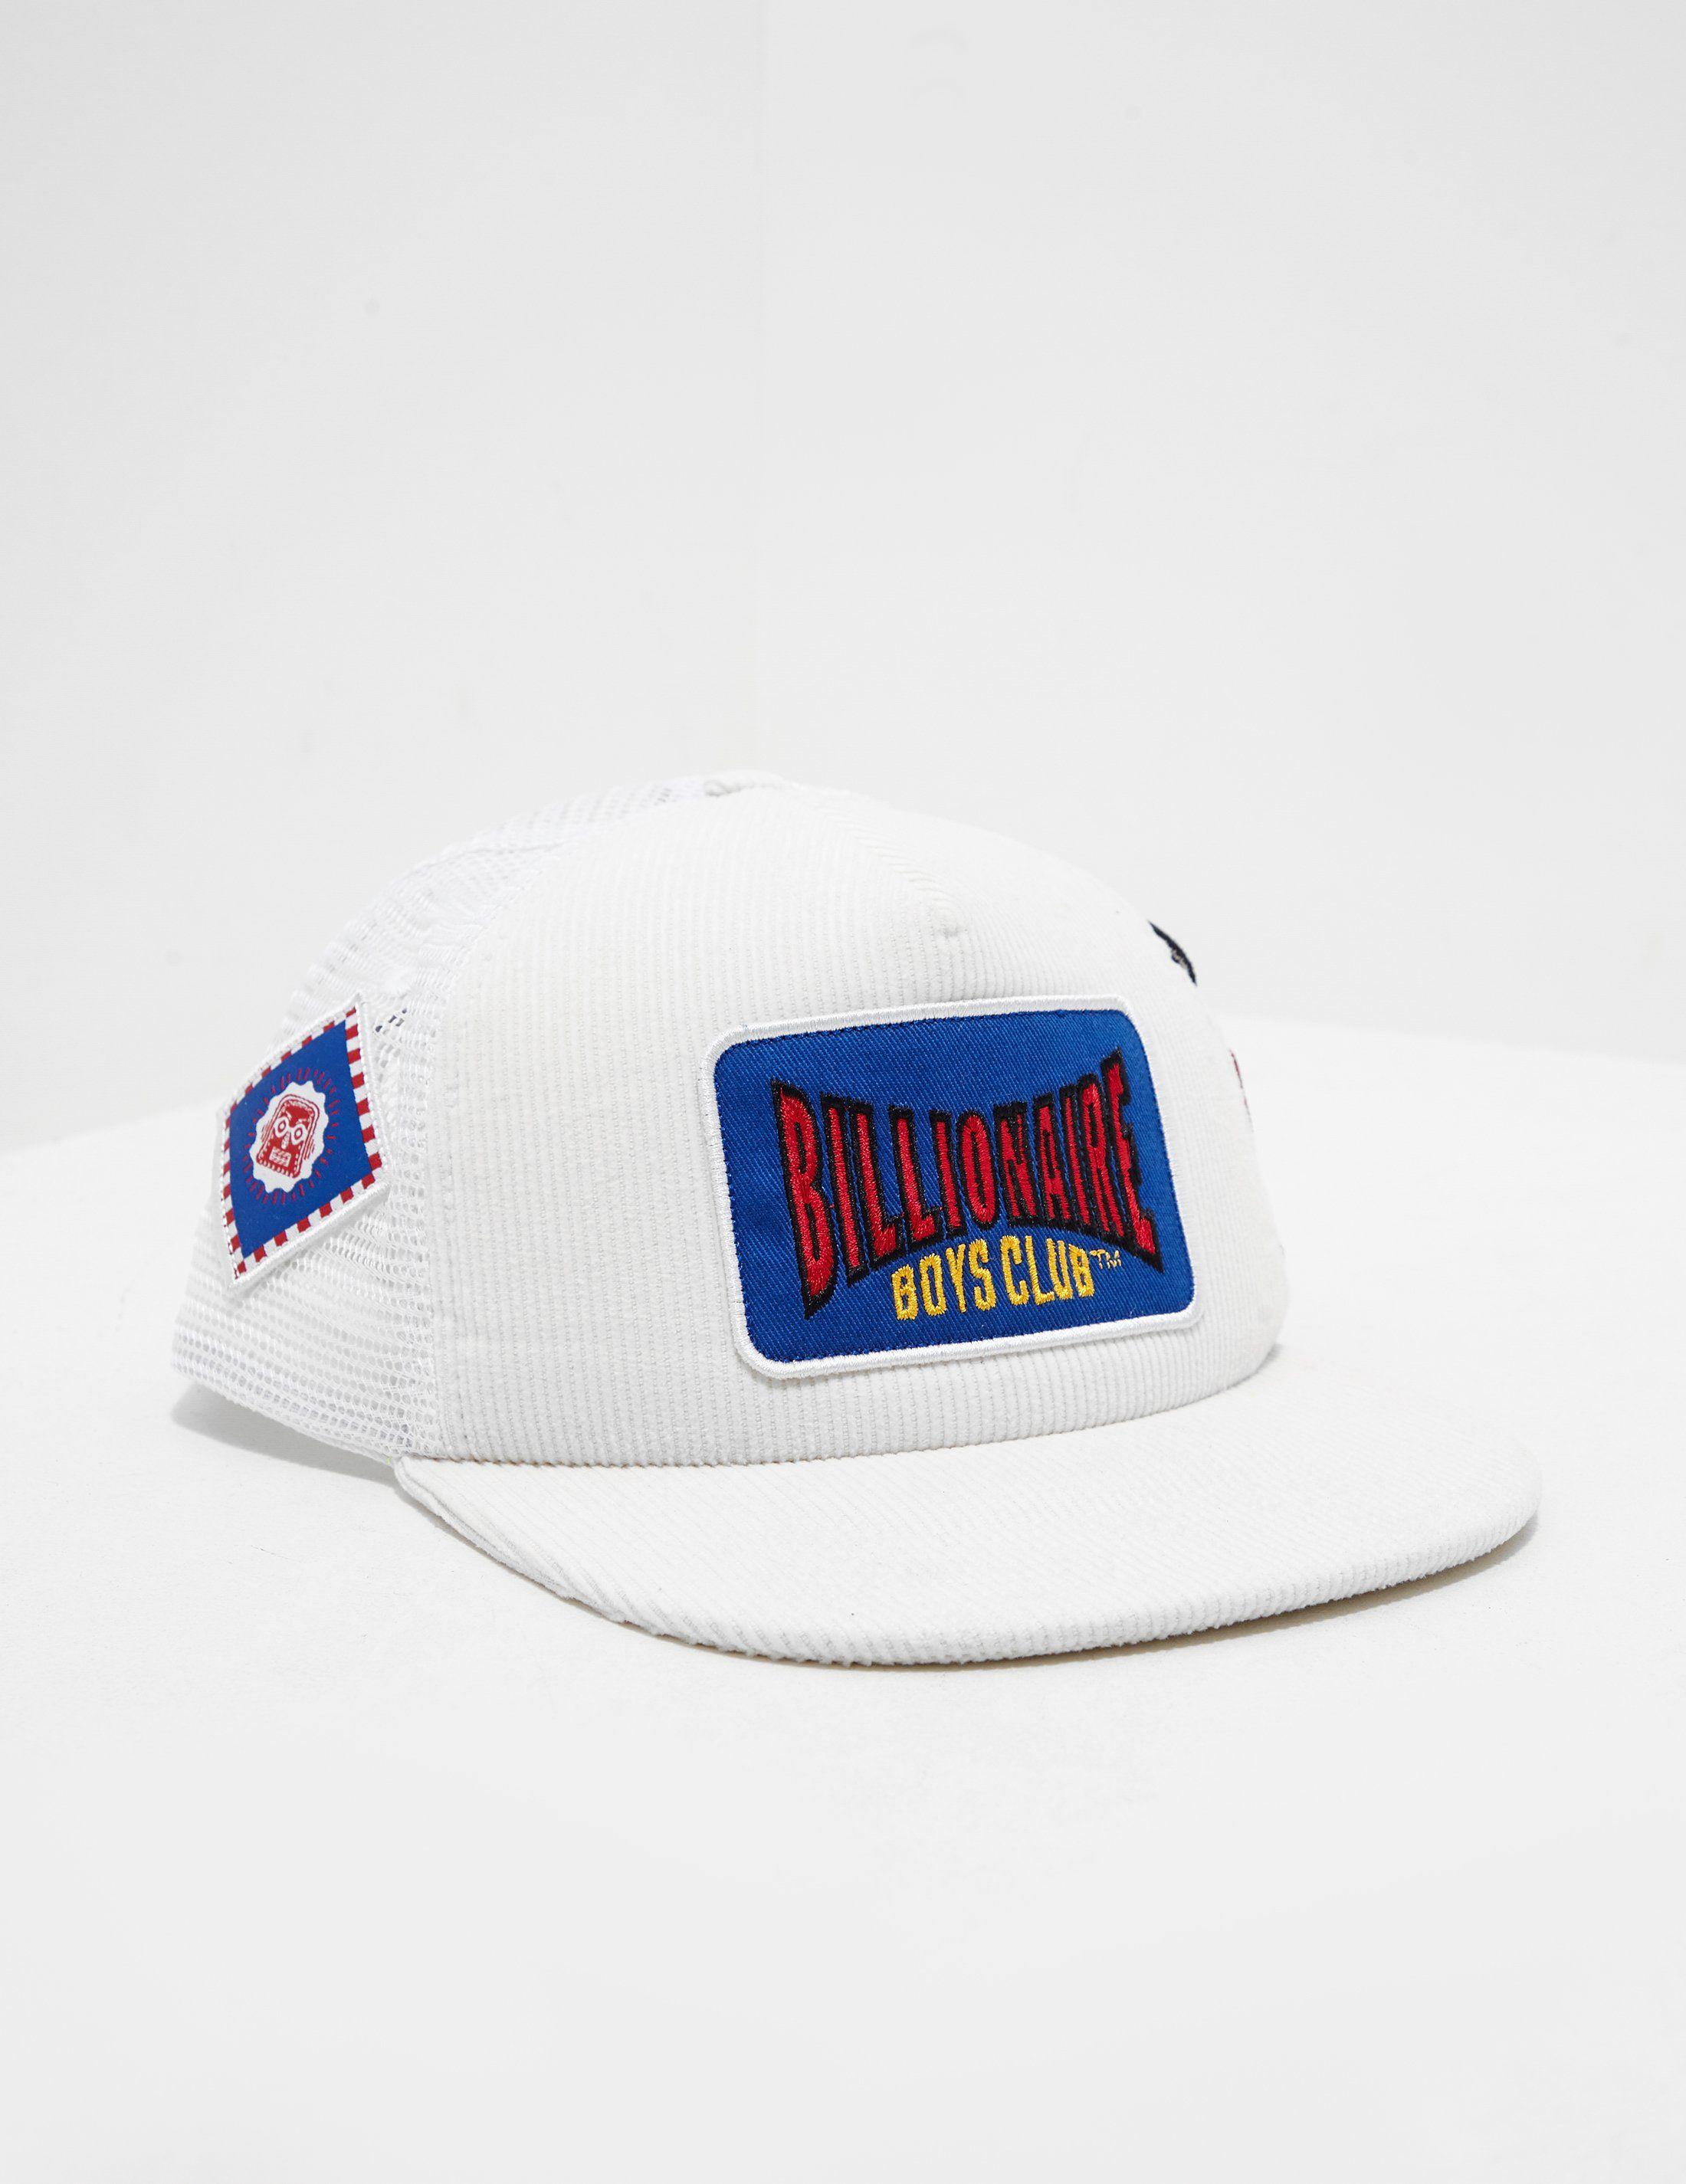 Billionaire Boys Club Trucker Cap